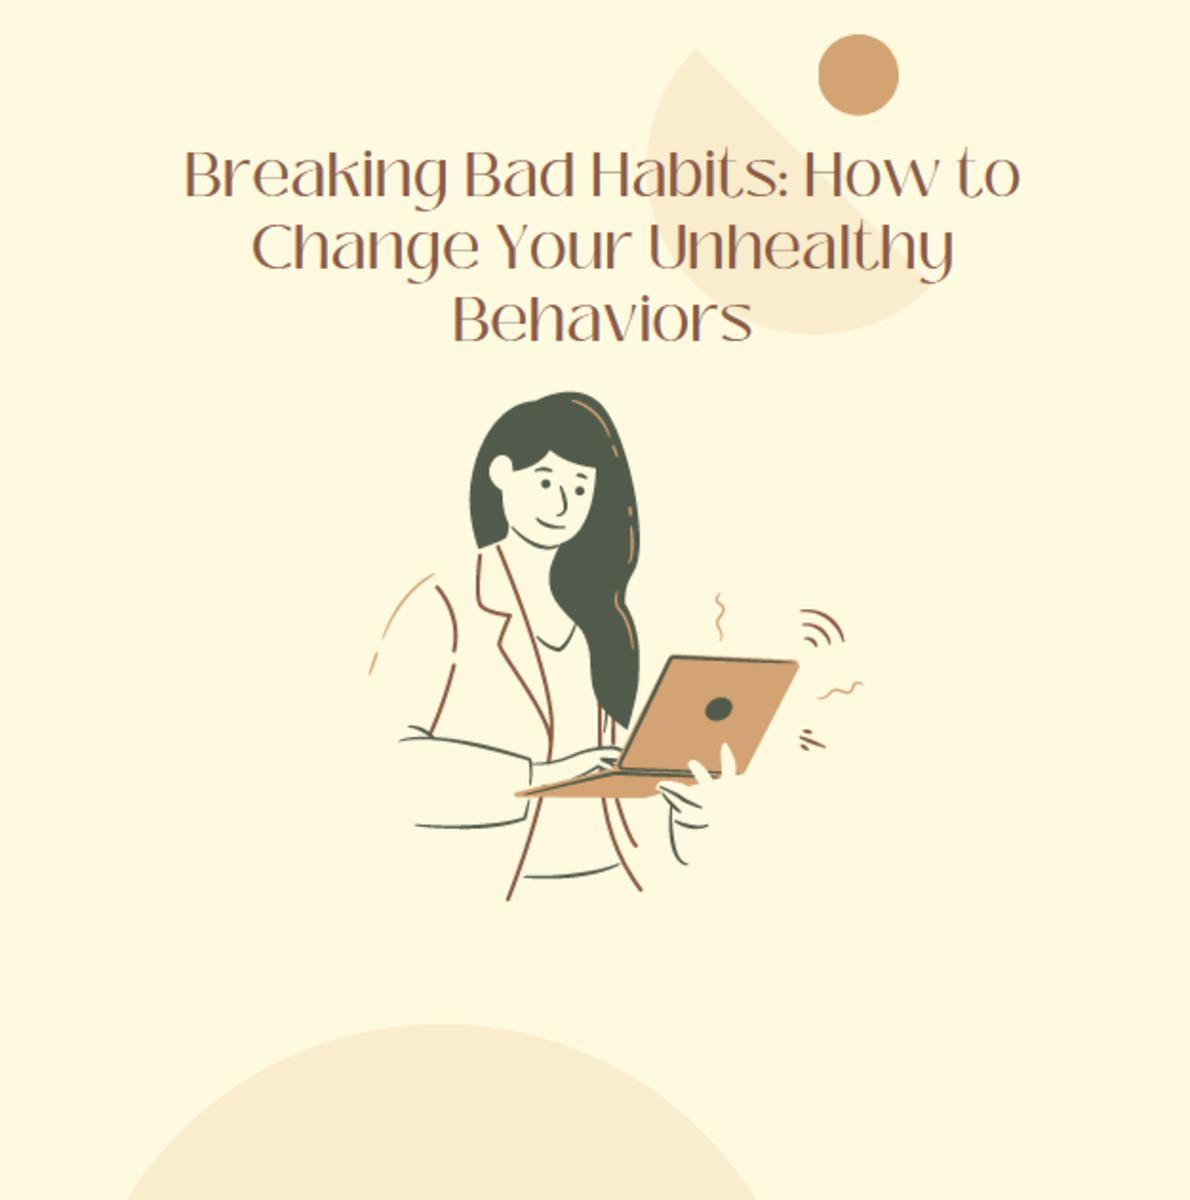 Breaking Bad Habits: How to Change Your Unhealthy Behaviors